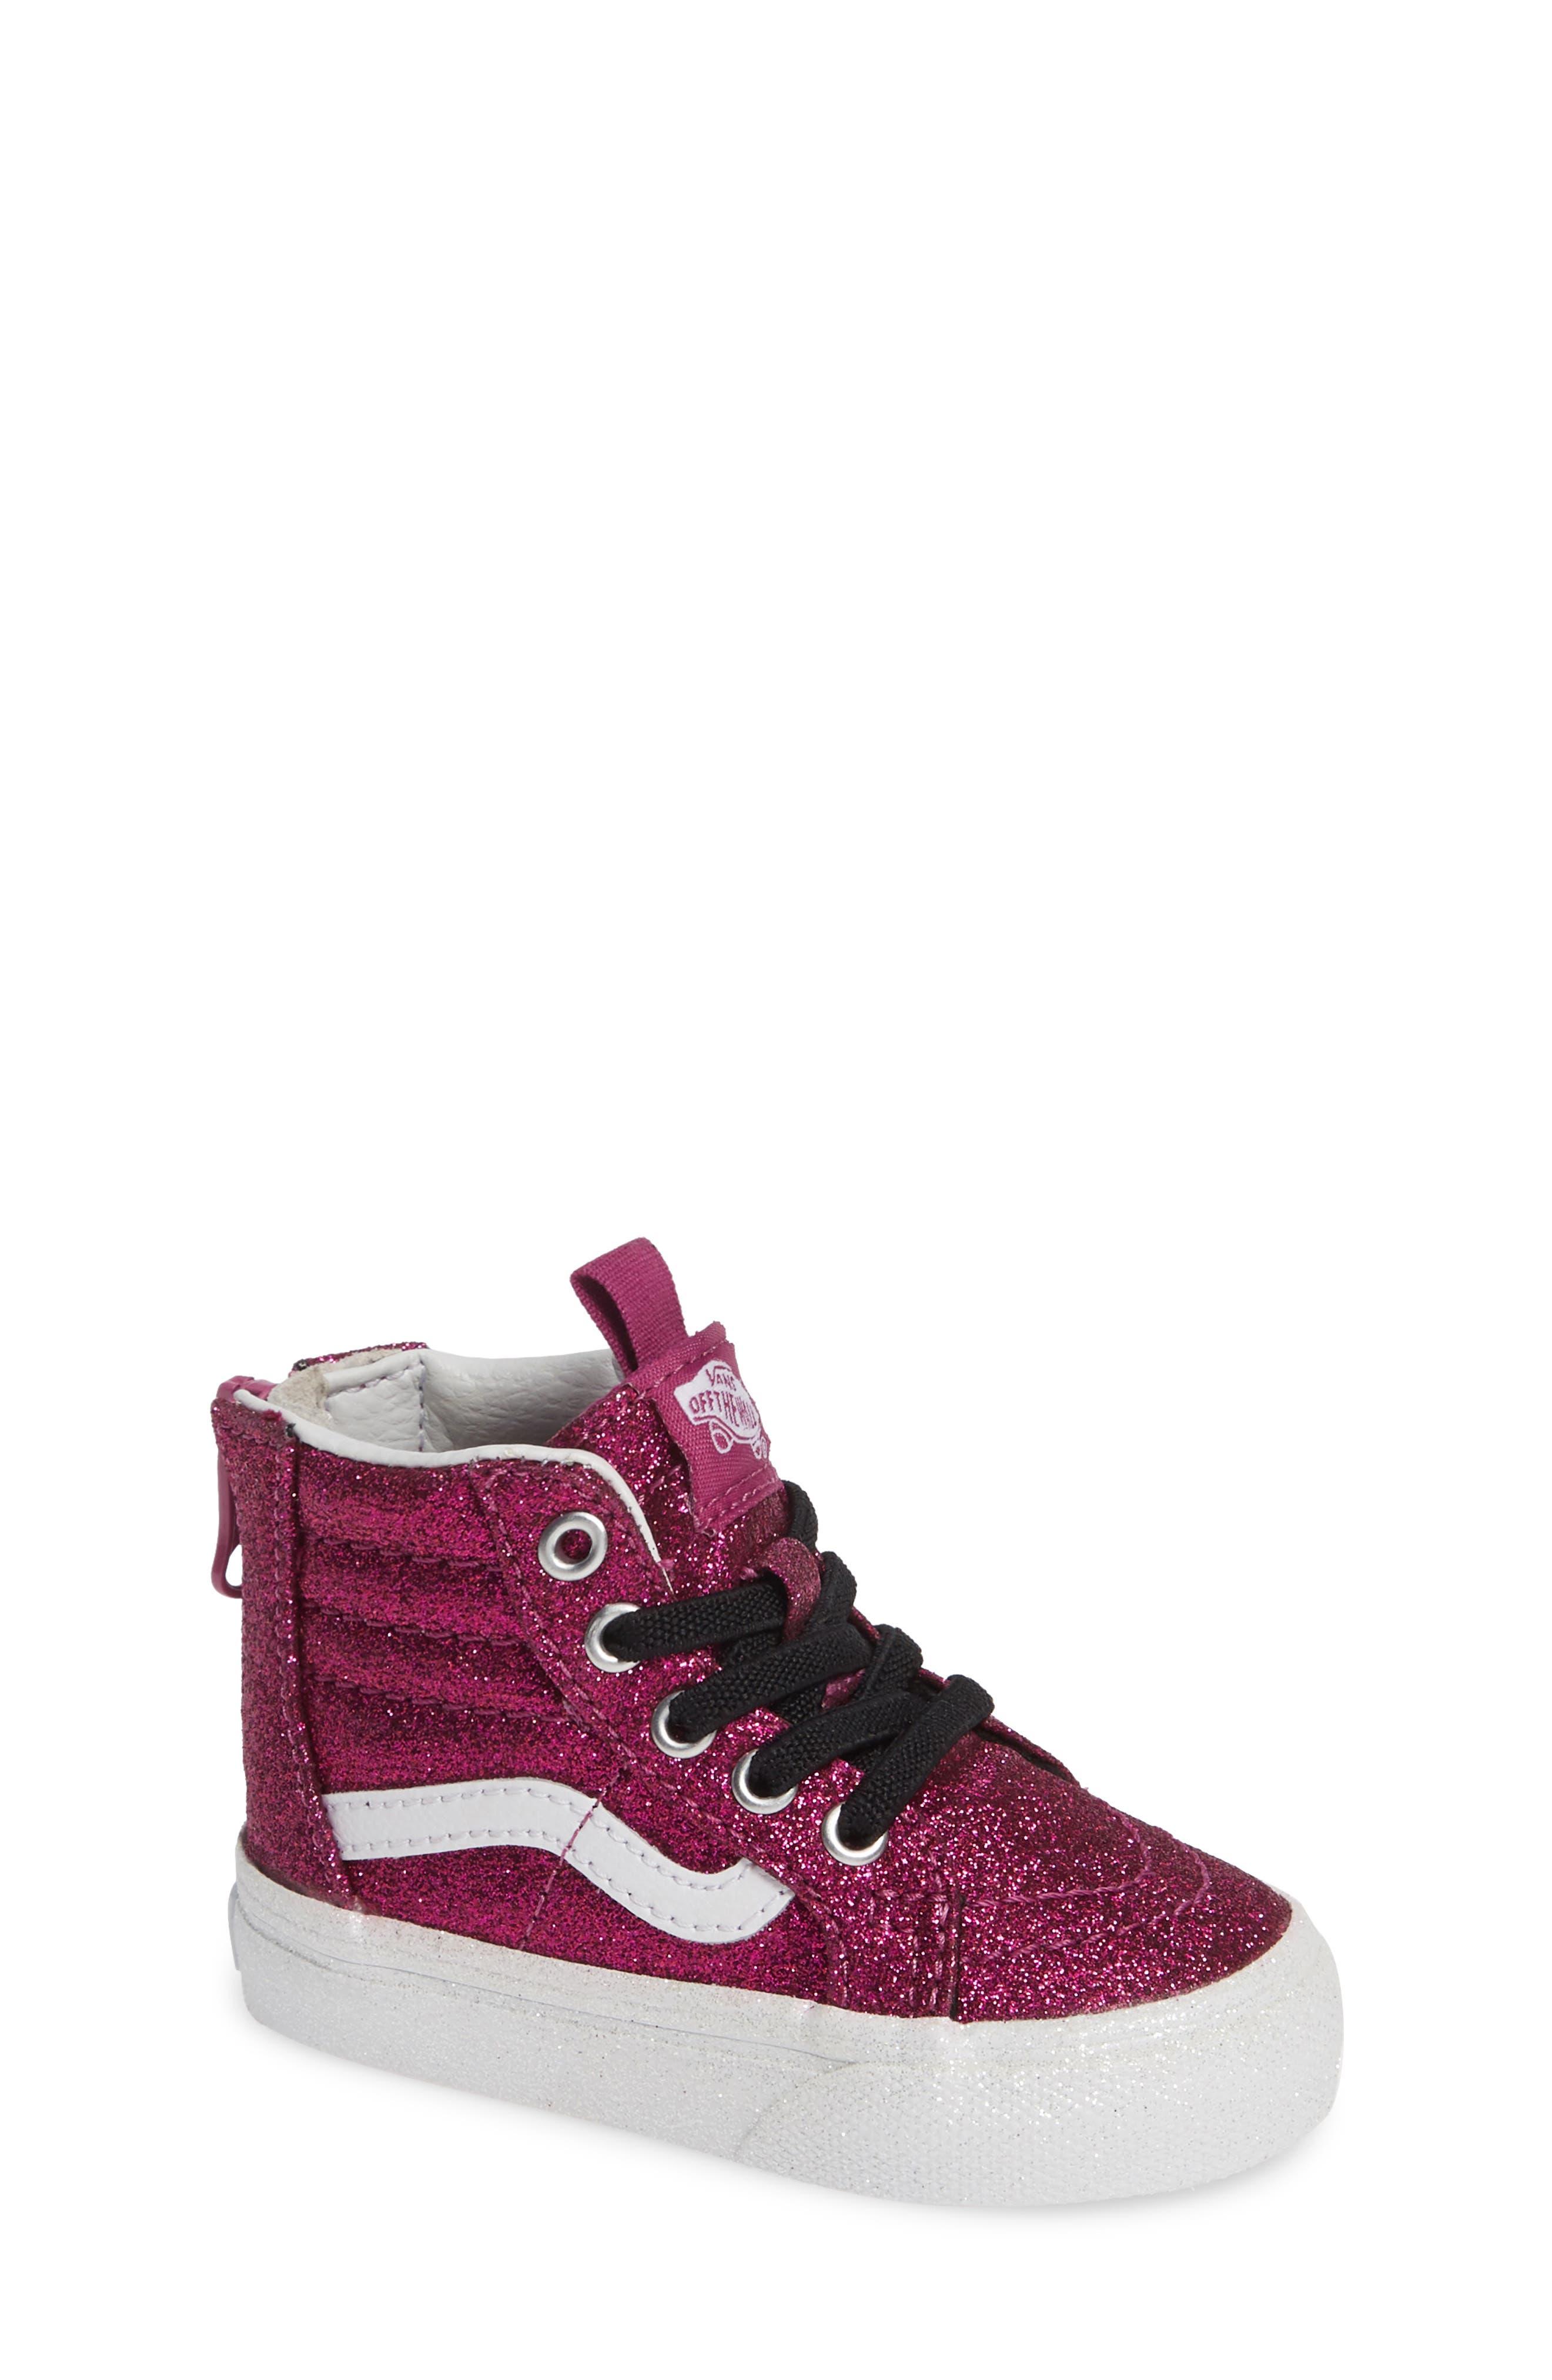 SK8-Hi Zip Sneaker,                             Main thumbnail 1, color,                             WILD ASTER/ TRUE WHITE